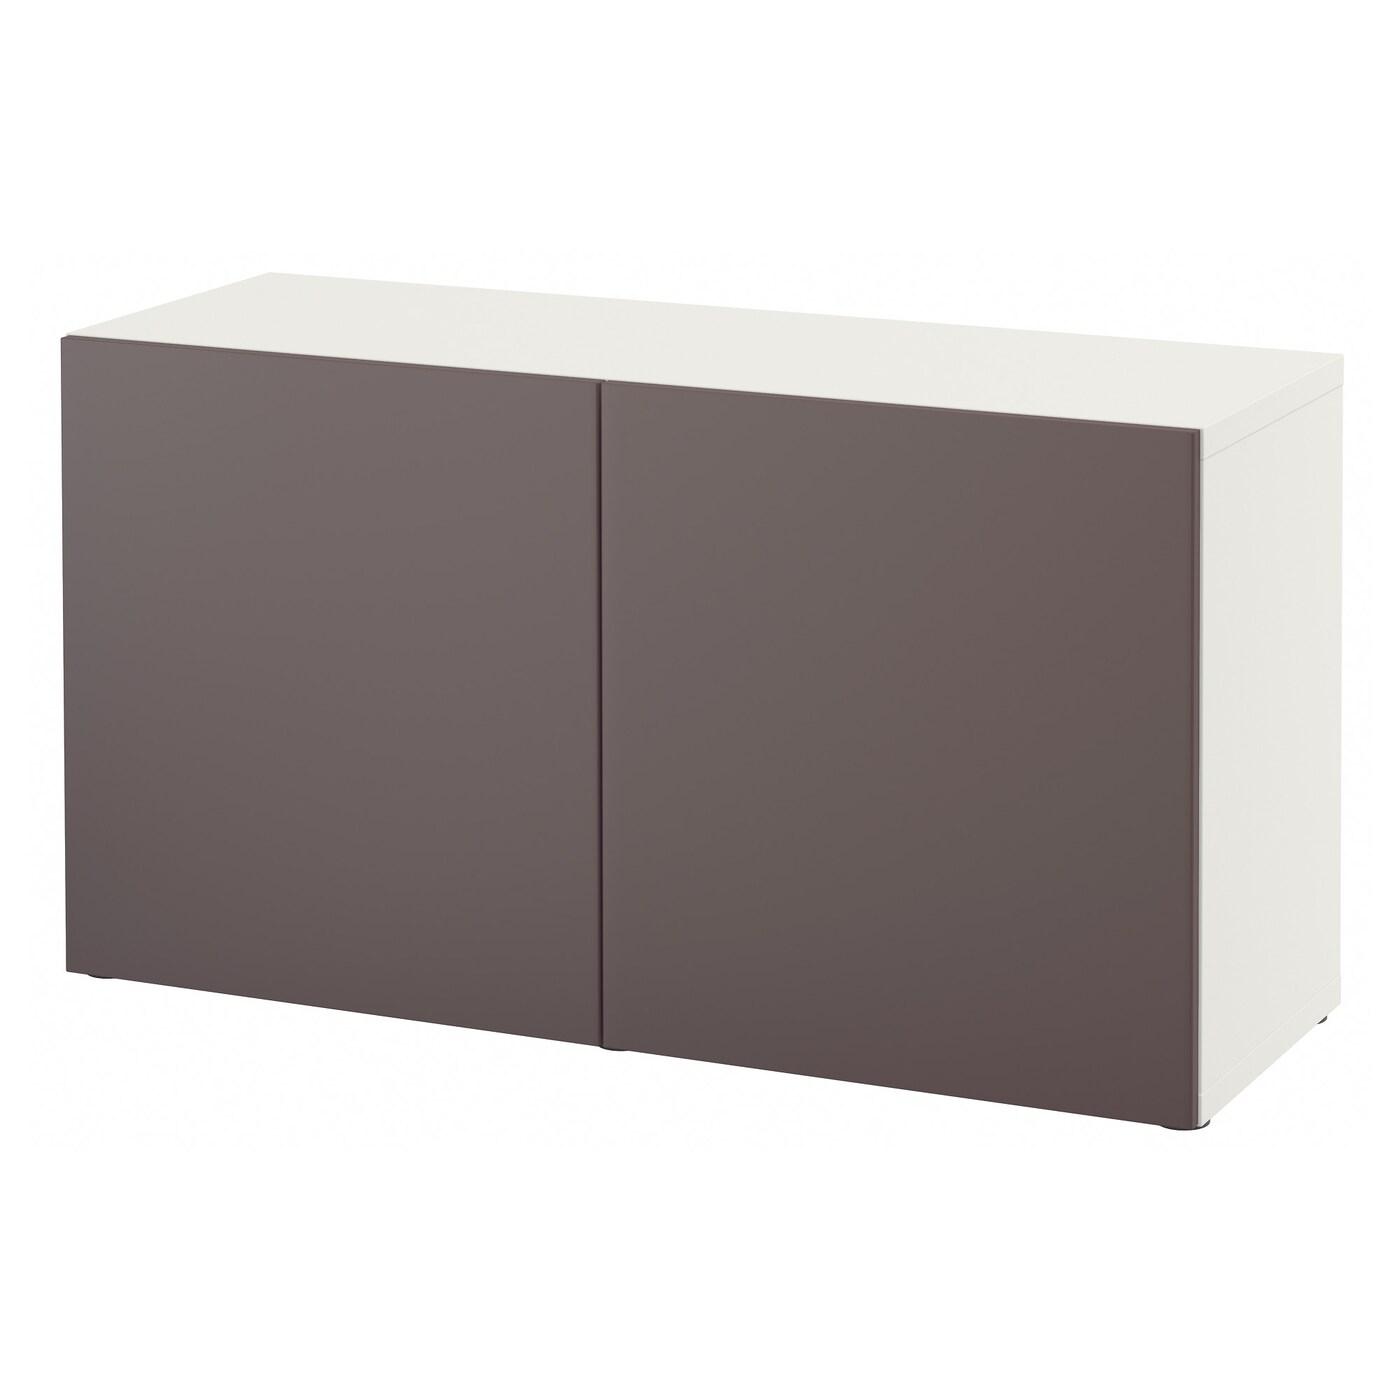 Best estanter a con puertas blanco valviken marr n oscuro 120 x 40 x 64 cm ikea - Estanterias besta ikea ...